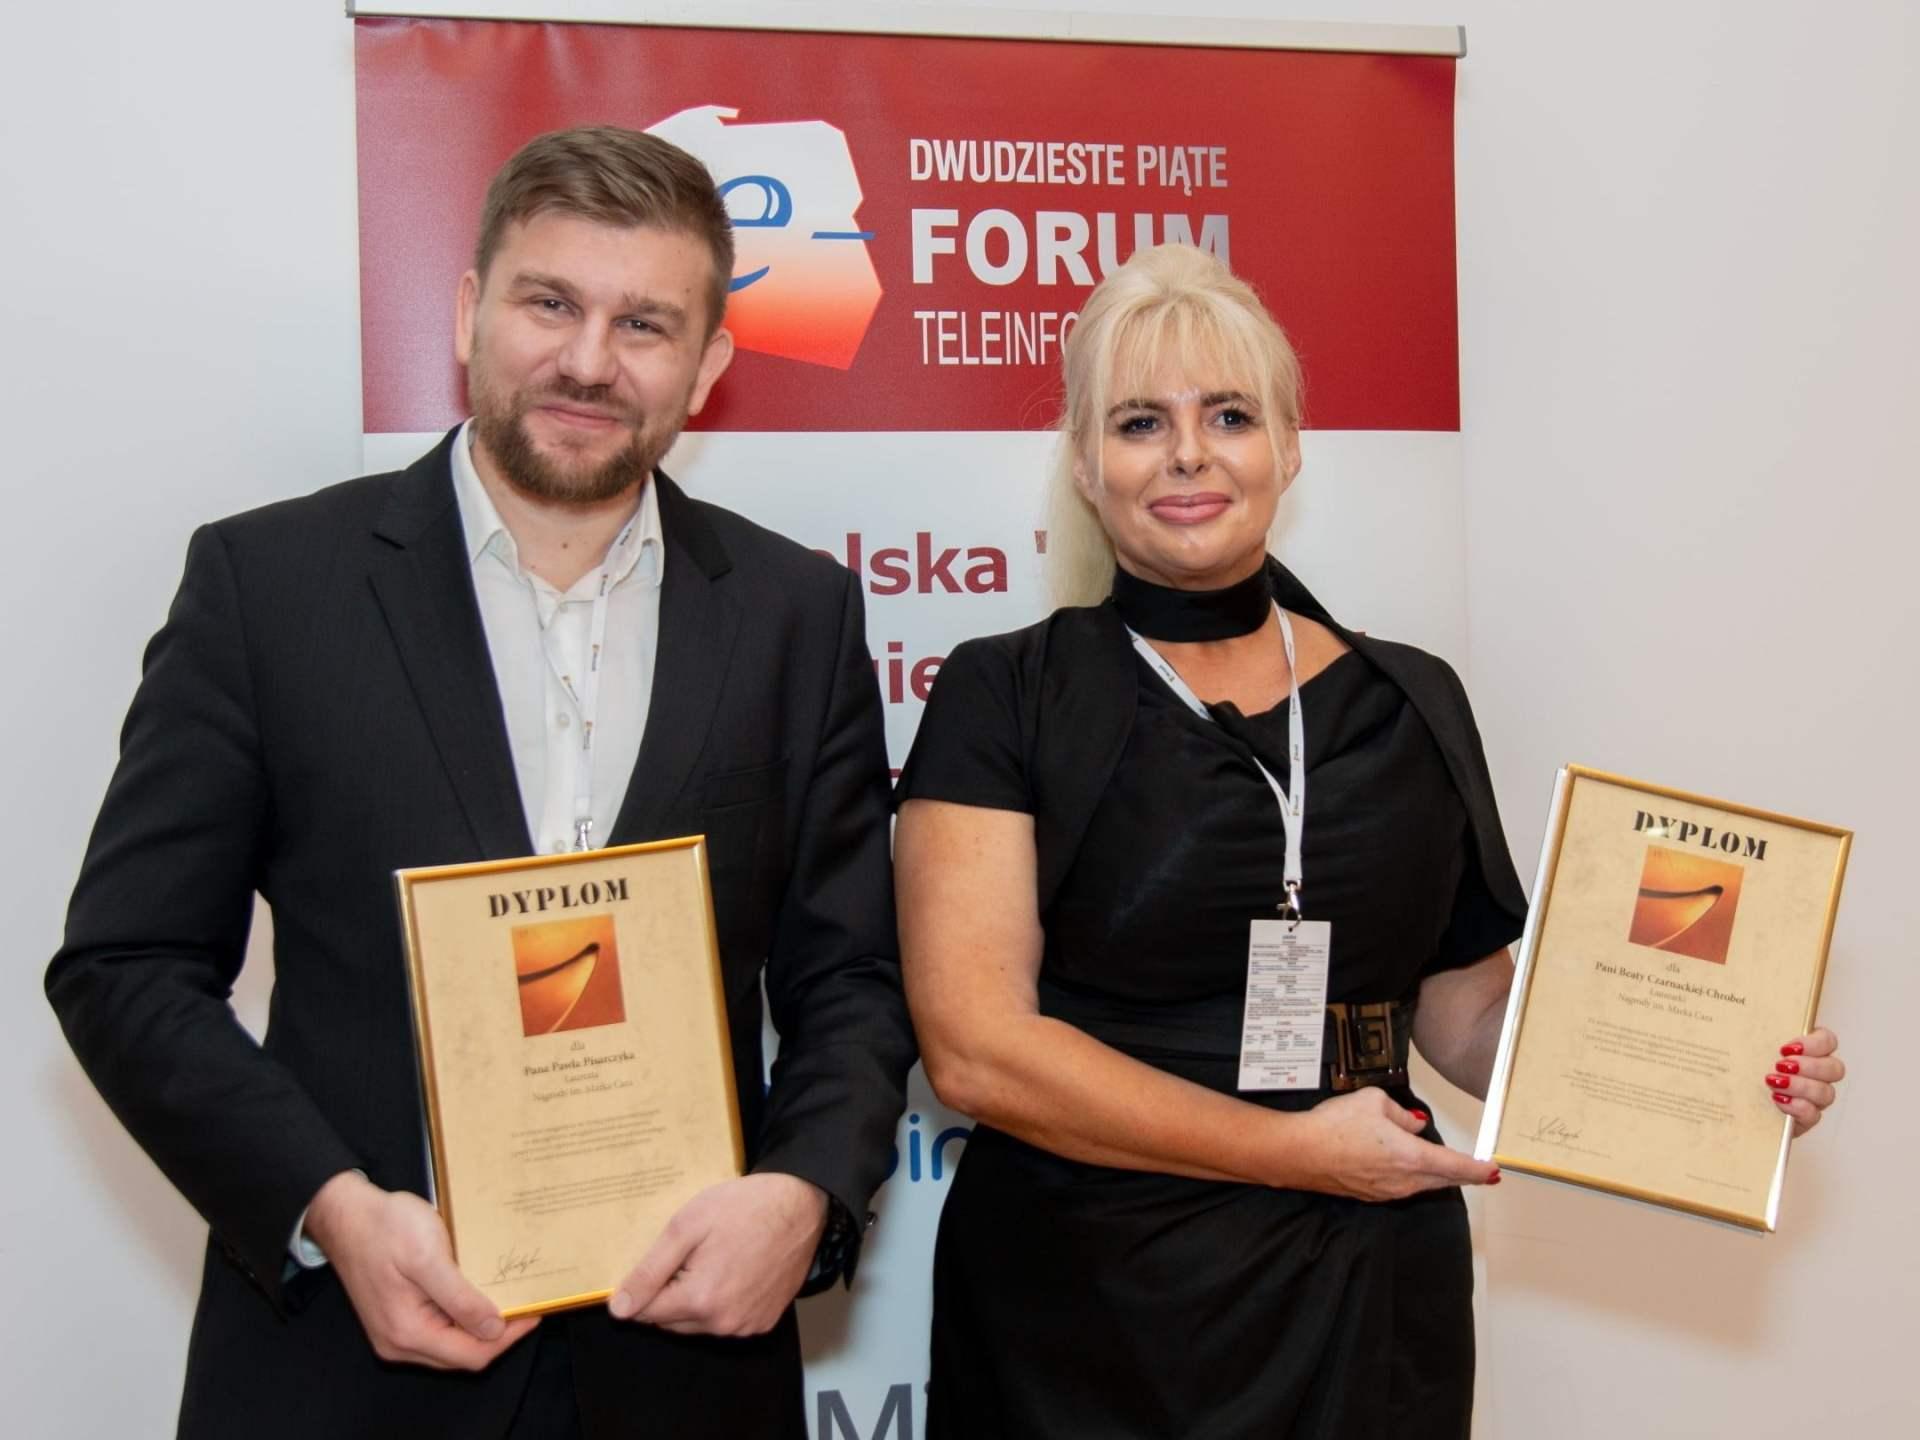 forum teleinformatyki, nagroda, laureaci